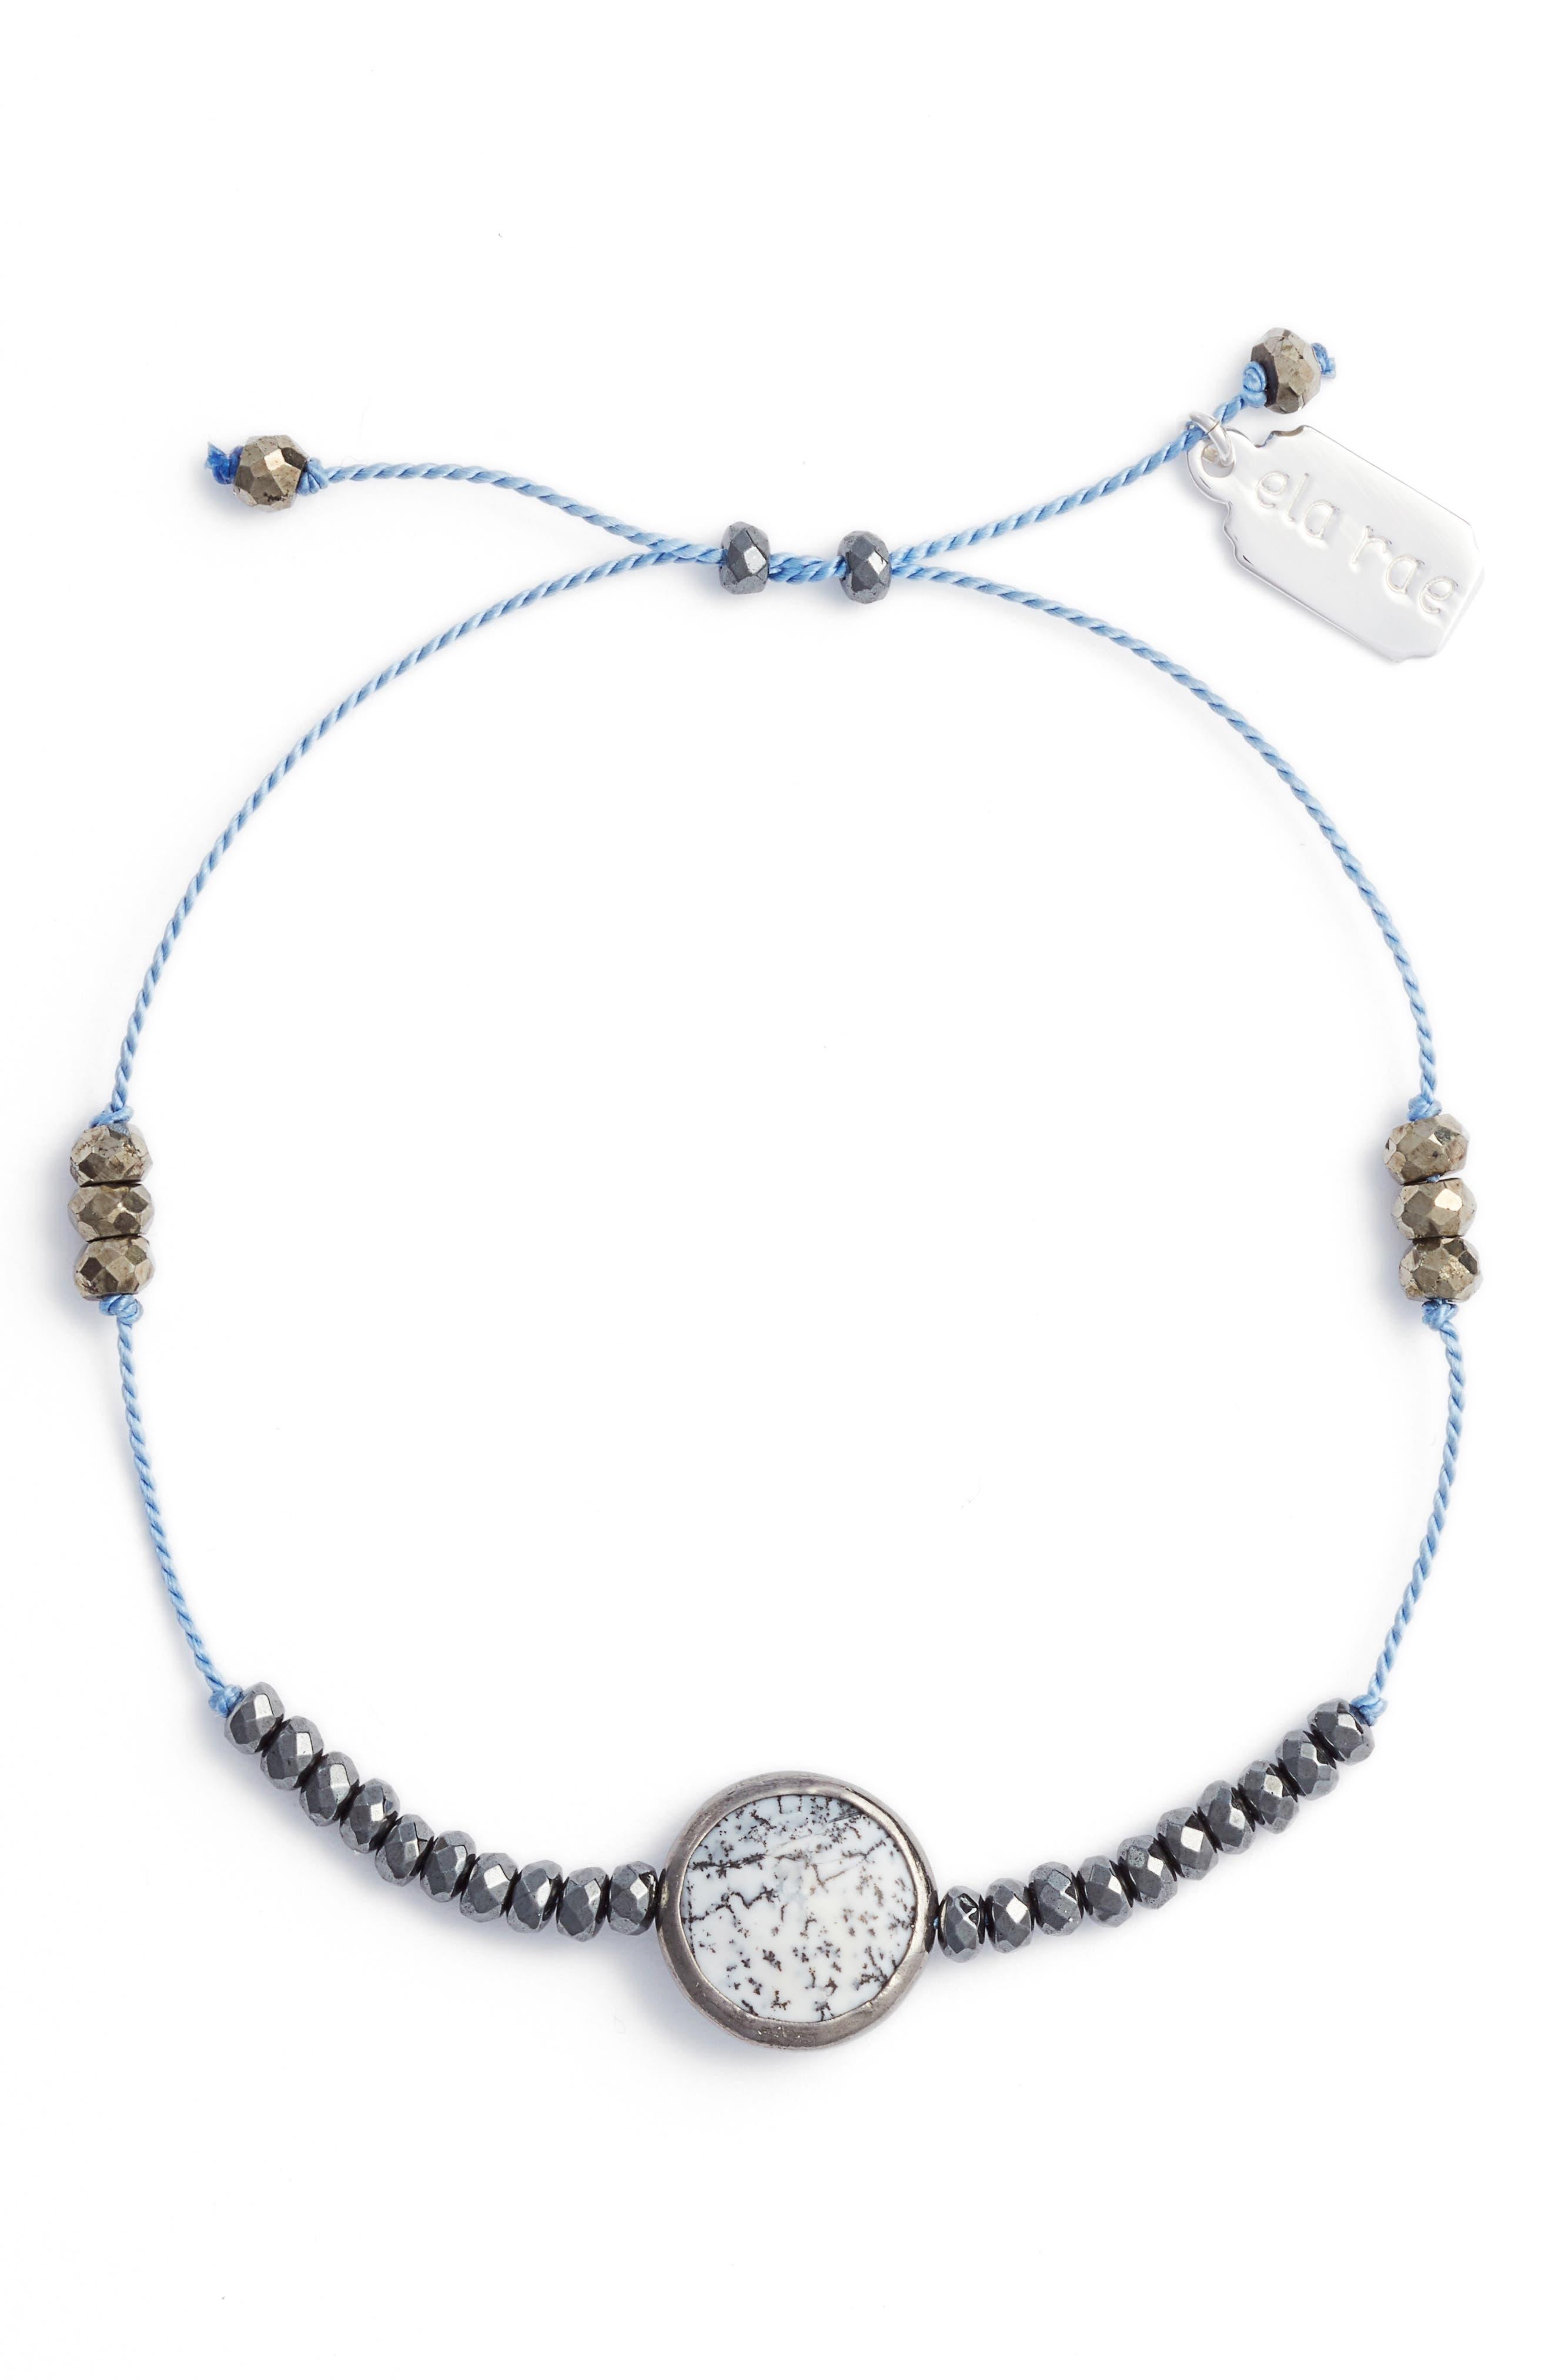 Sylvie Semiprecious Stone Bracelet,                         Main,                         color, Cornflower Blue/ Hematite